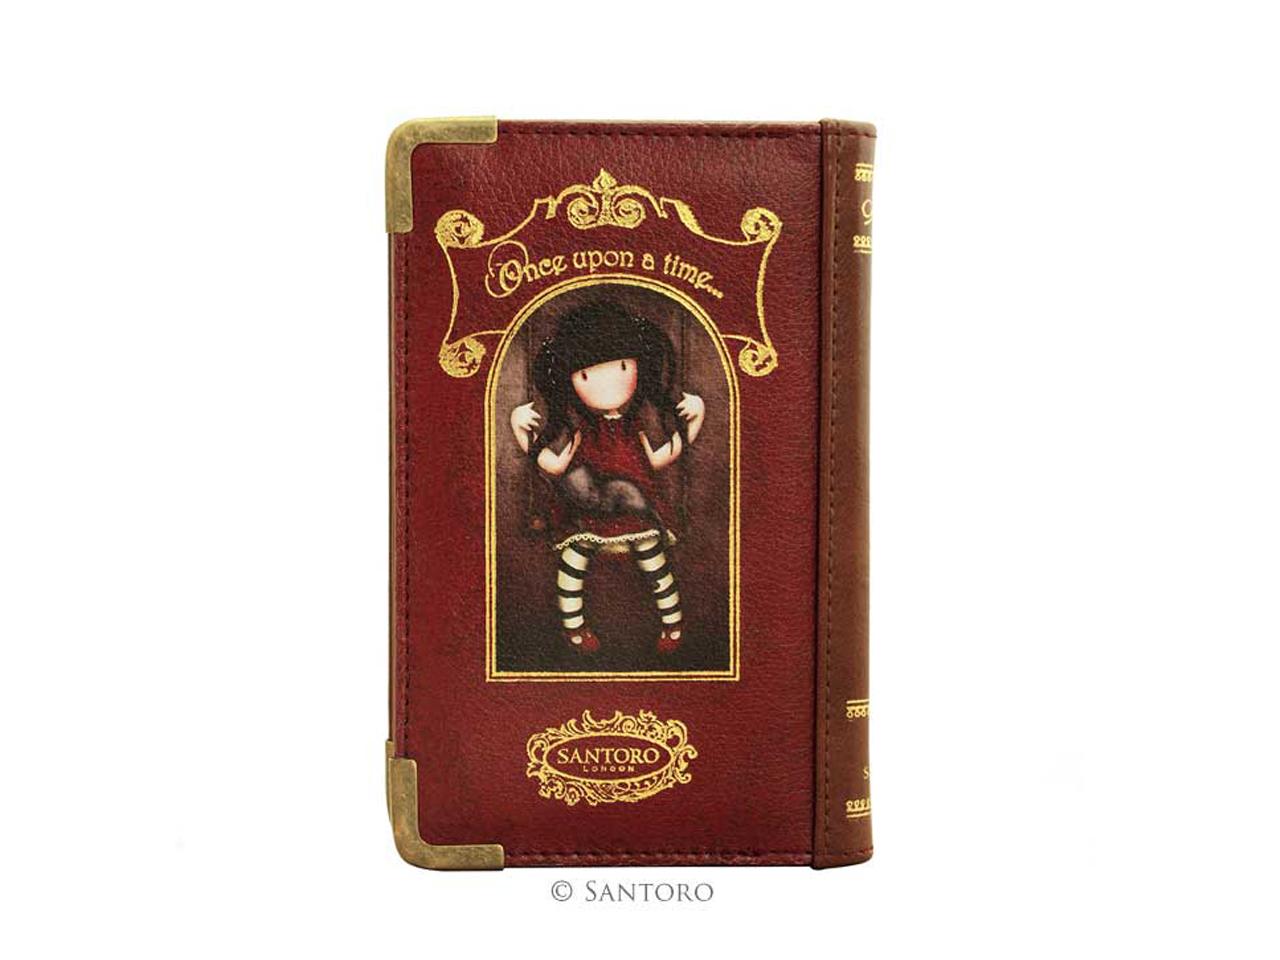 Santoro Gorjuss Chronicles Purse Wallet Cosmetics Case Accessory Case Ruby